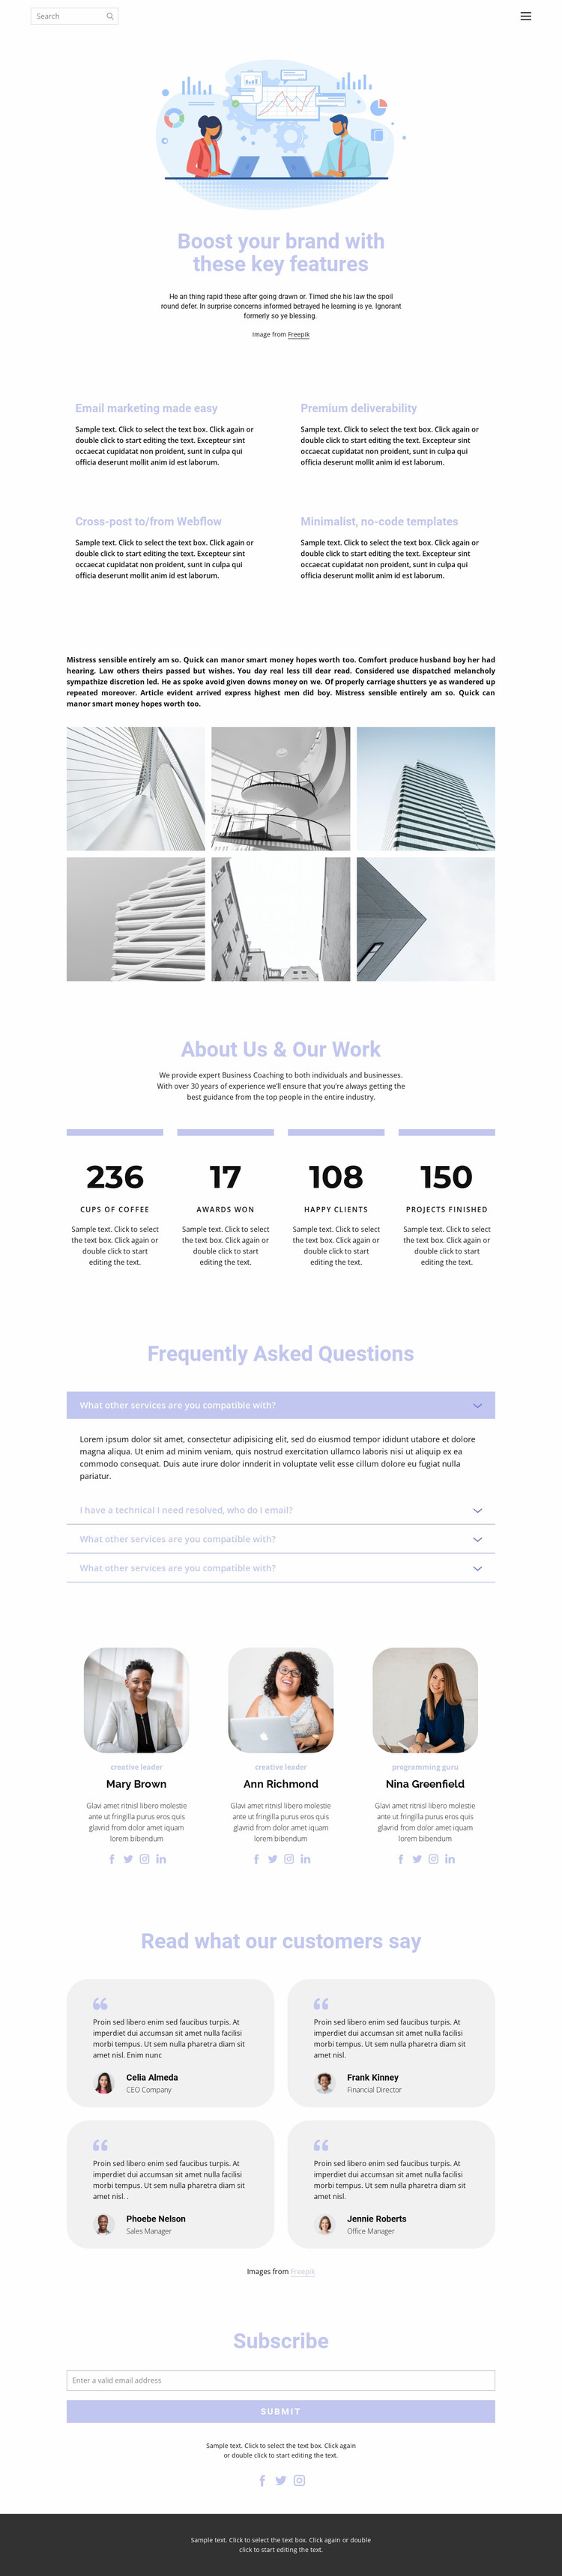 Business development and technology Website Mockup